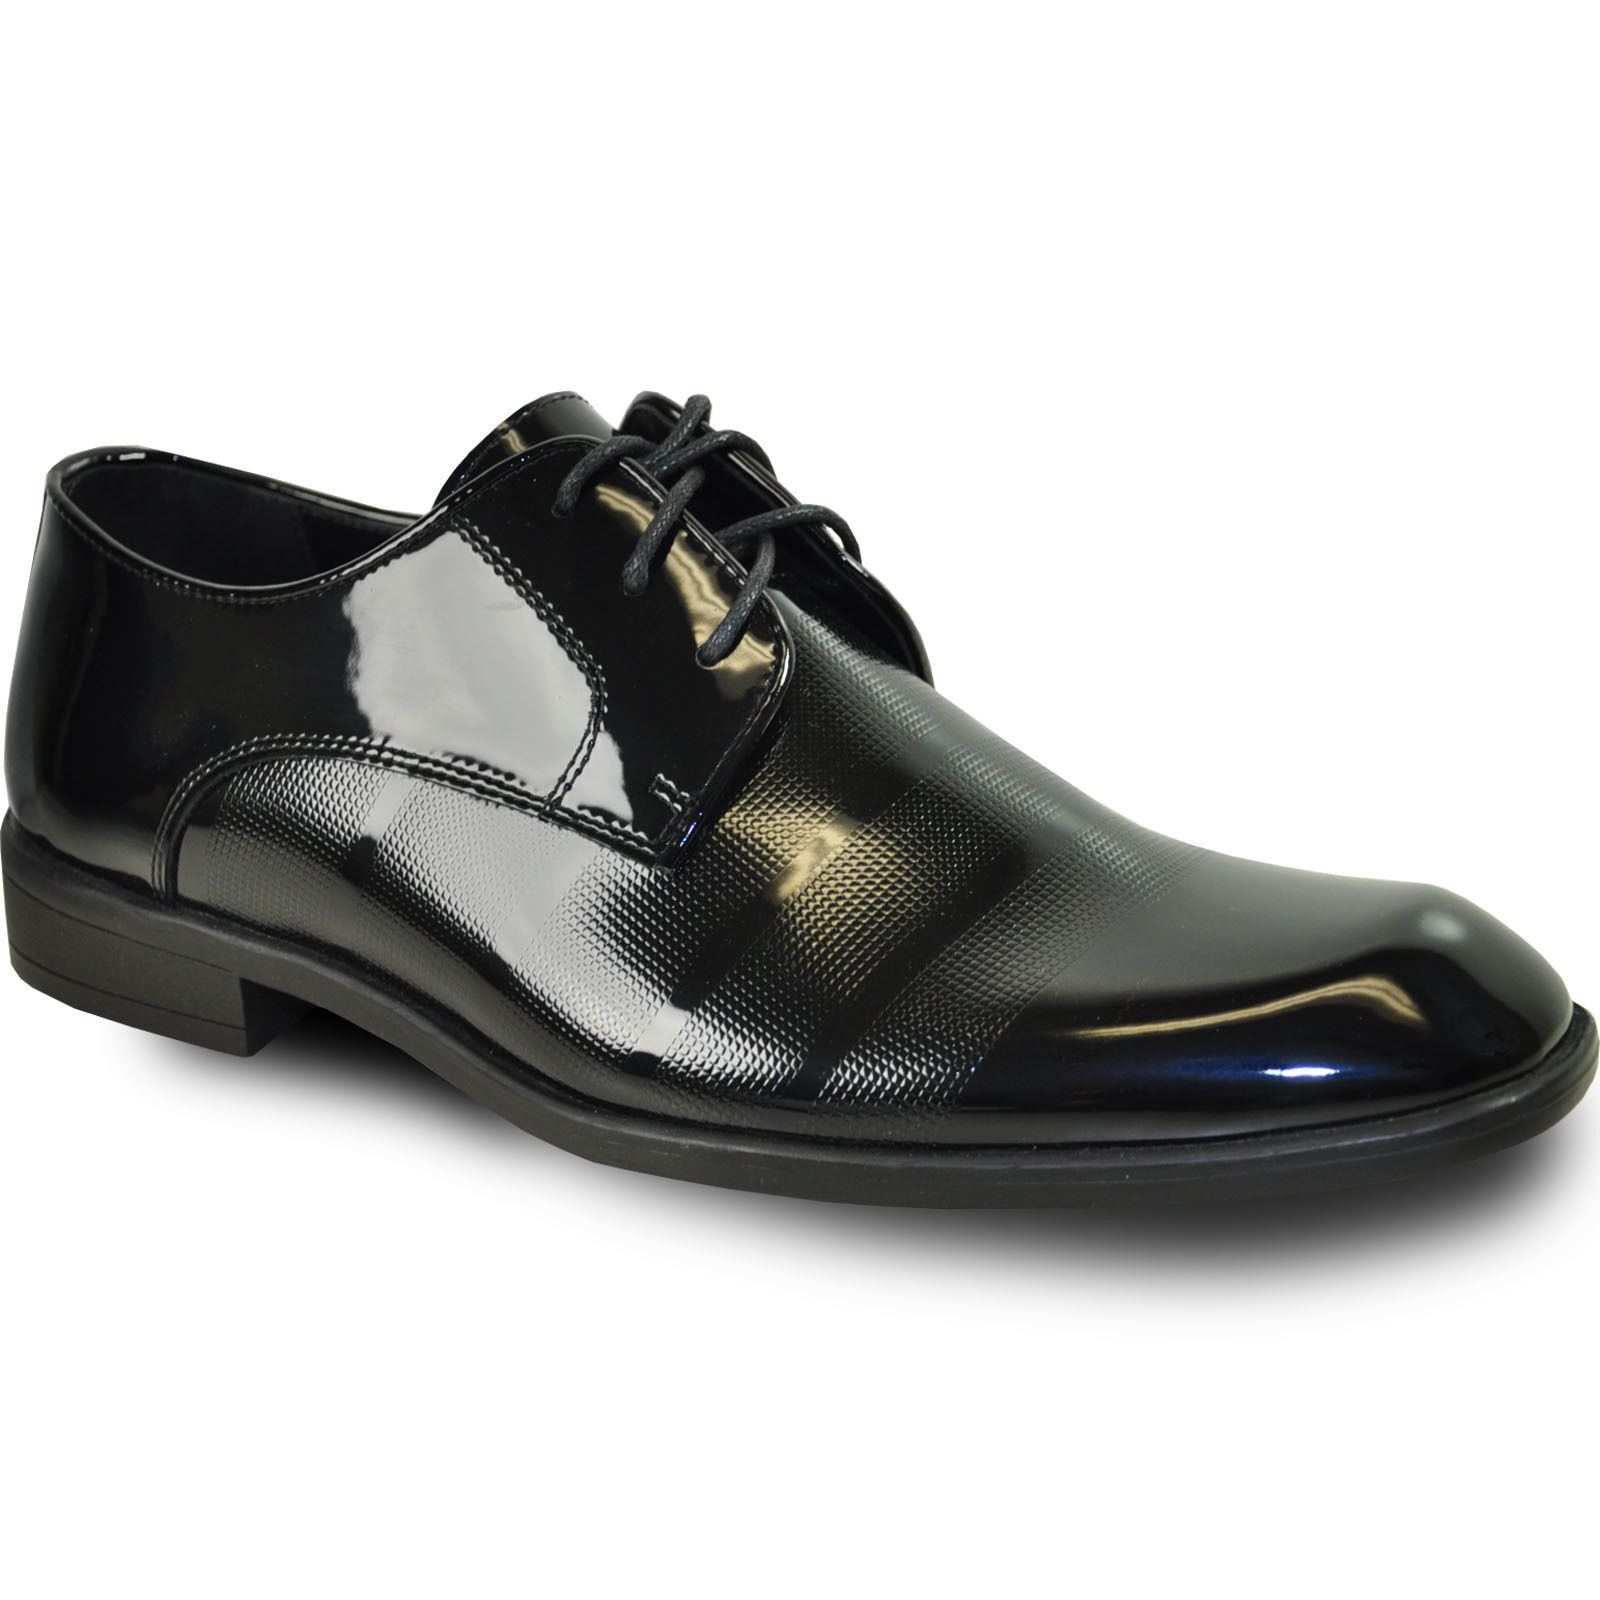 alta qualità generale VANGELO    ROCKEFELLER Uomo Tuxedo scarpe For Formal Wedding nero  consegna rapida